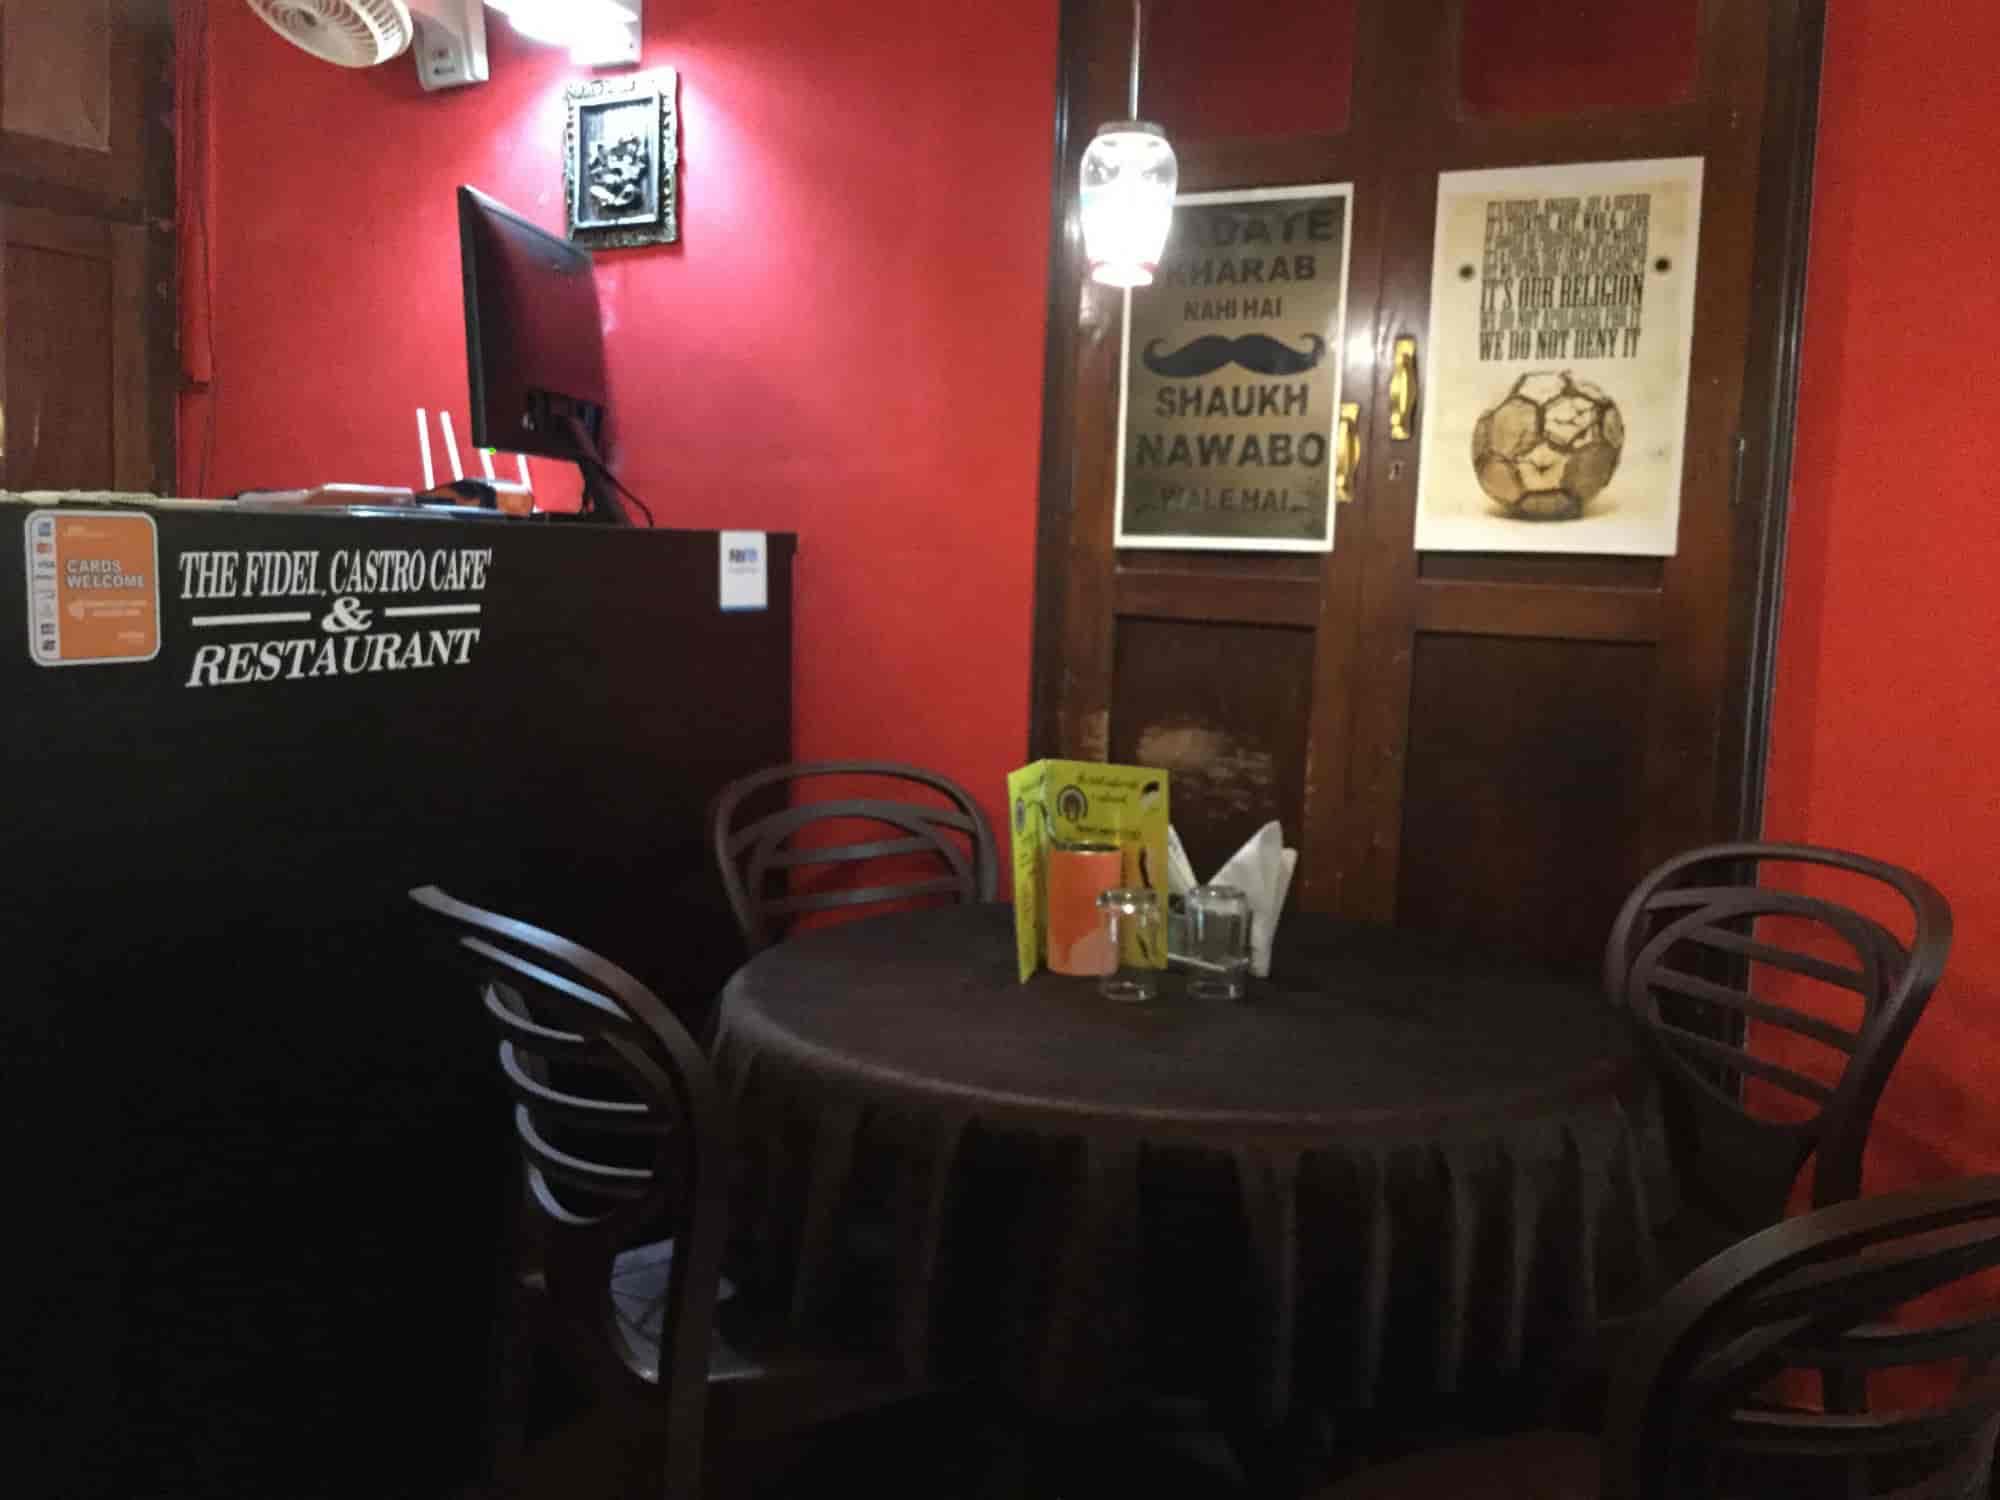 The Fidel Castro Cafe Restaurant Photos Ravindrapuri Varanasi  # Muebles Heve Castro